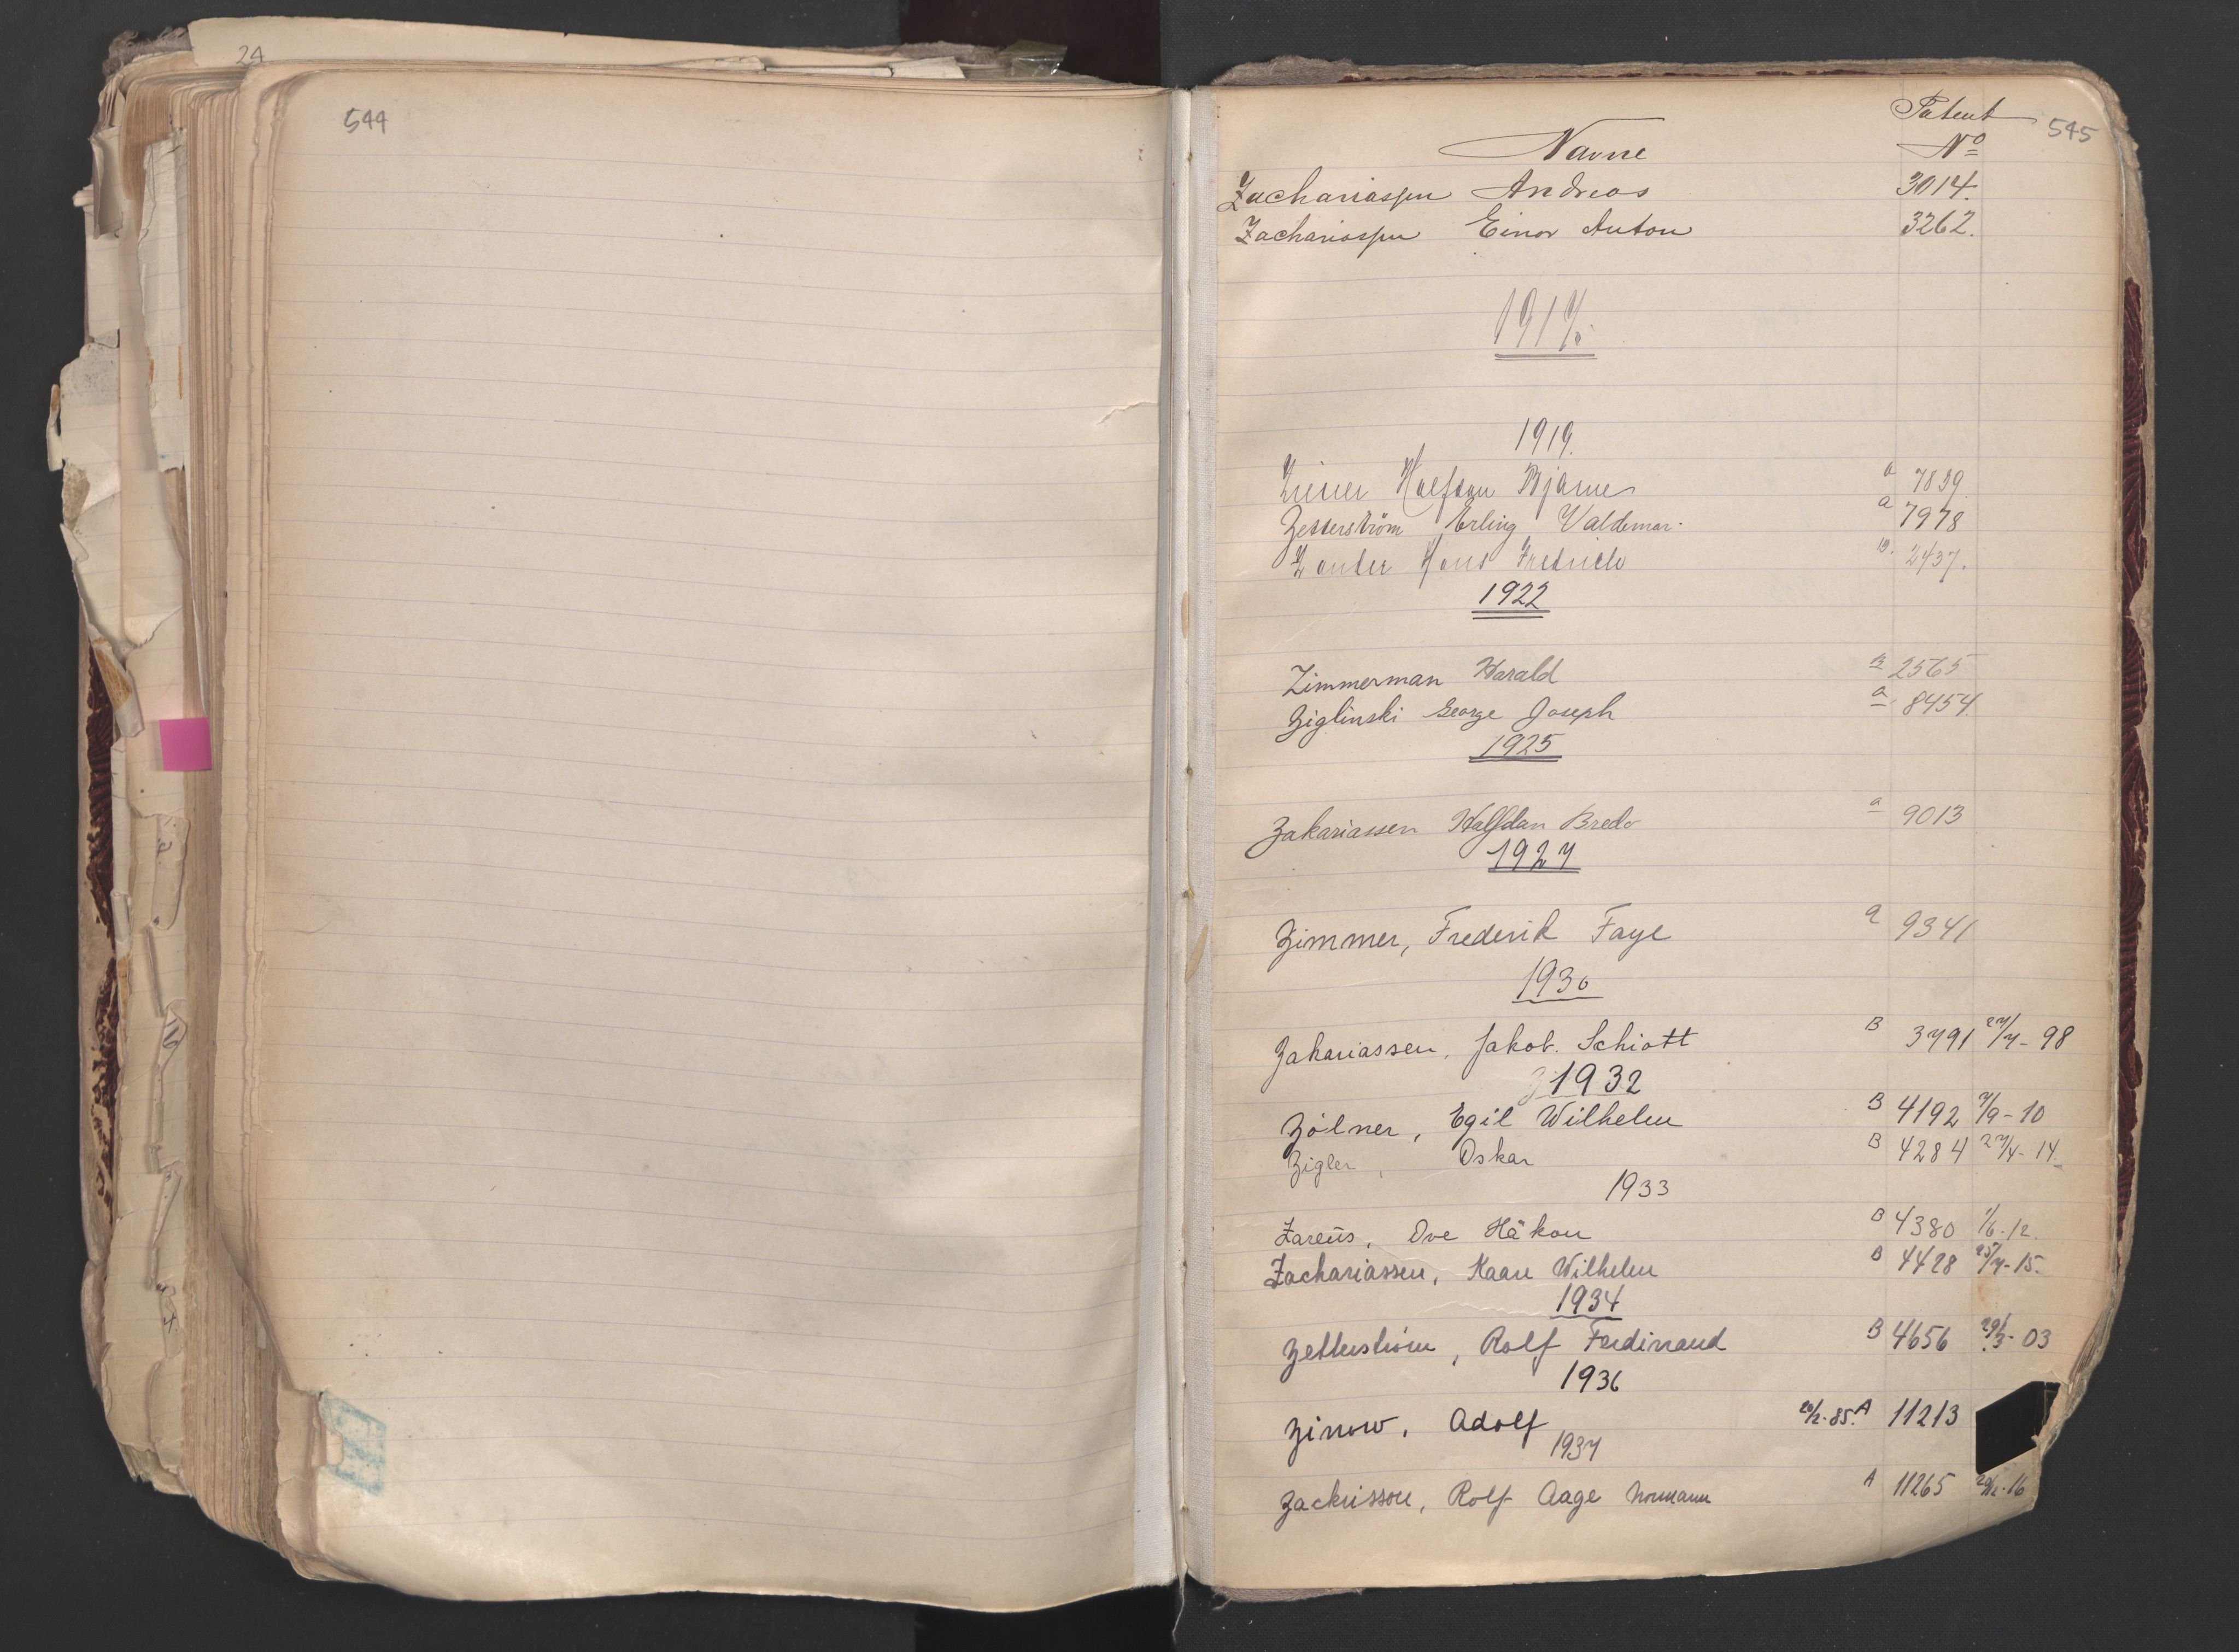 SAO, Oslo sjømannskontor, F/Fa/L0003: Register for Oslo mønstringskrets, 1891-1948, s. 544-545